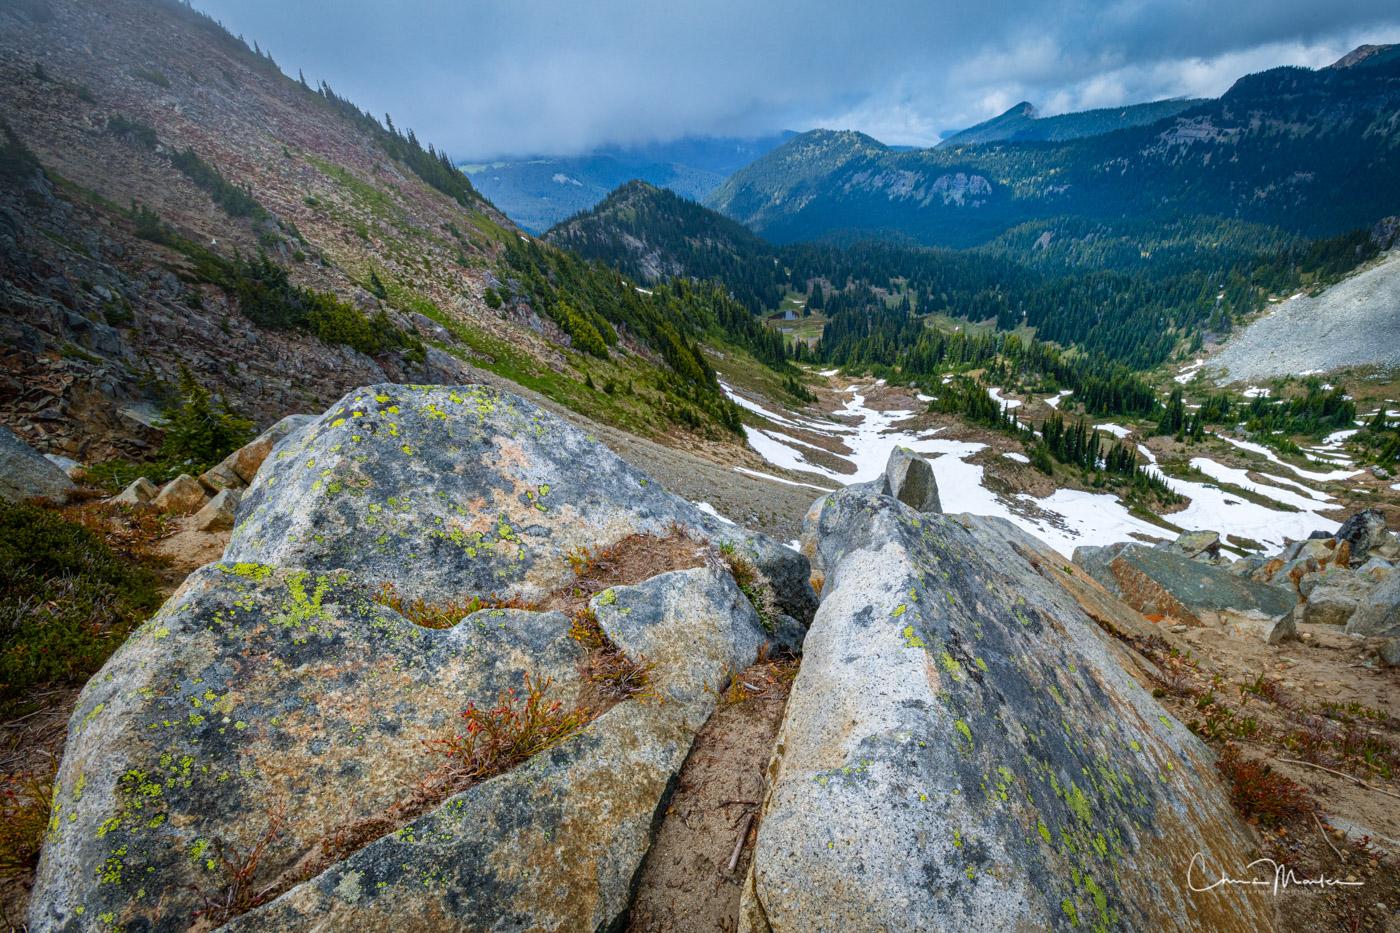 wilderness awaits, Mt. Rainier National Park, mountain vista, hiking in mt rainier, explore the wilderness, photo